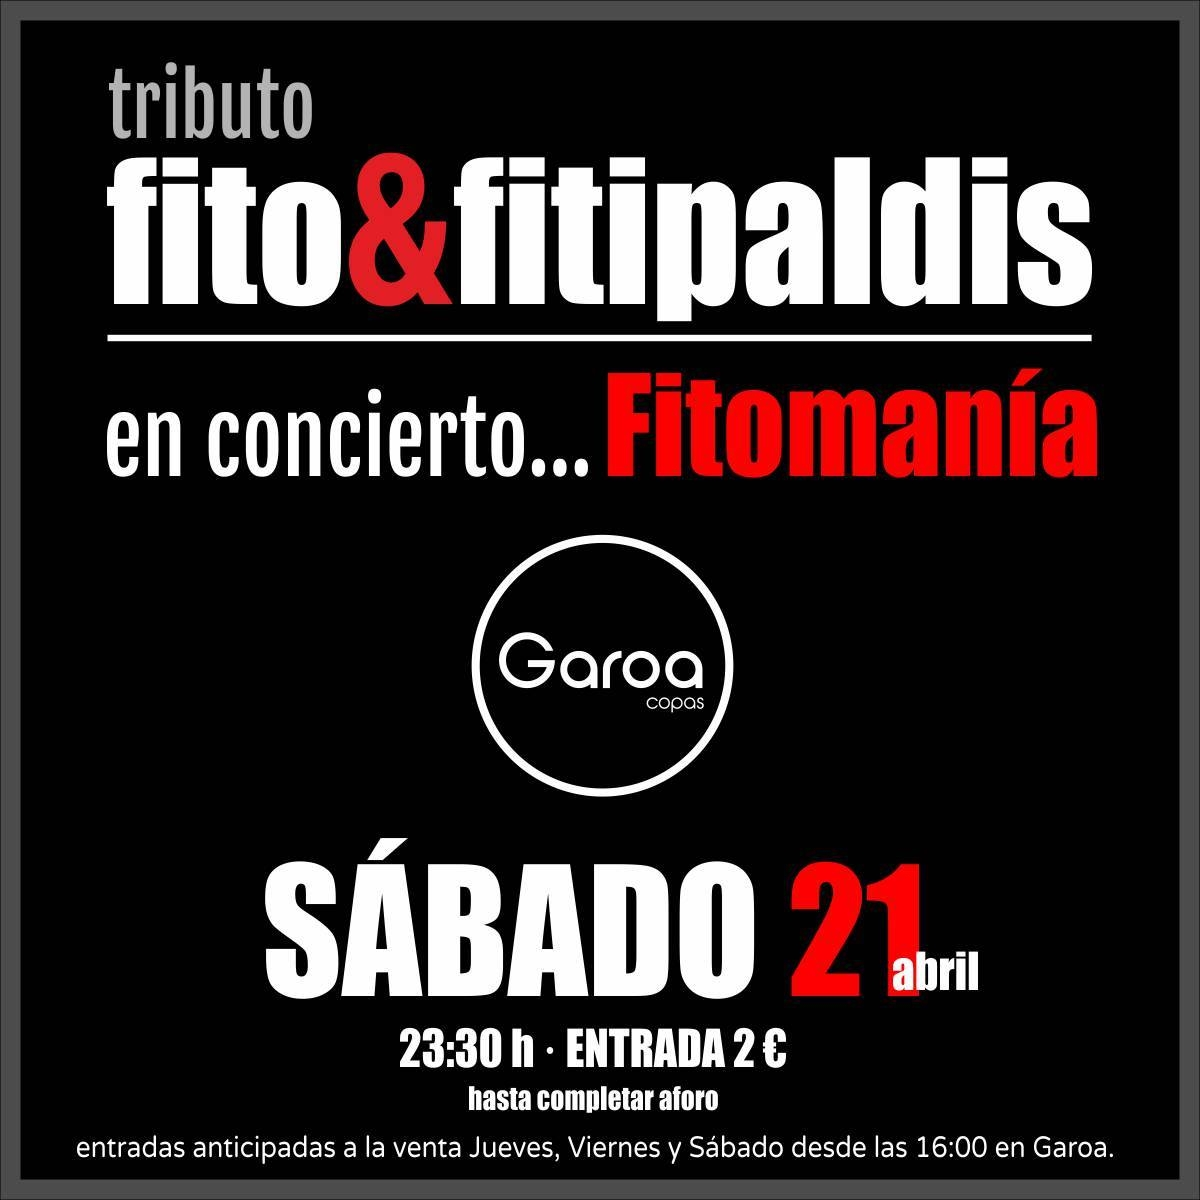 Fitomanía - Tributo Fito y Fitipaldis